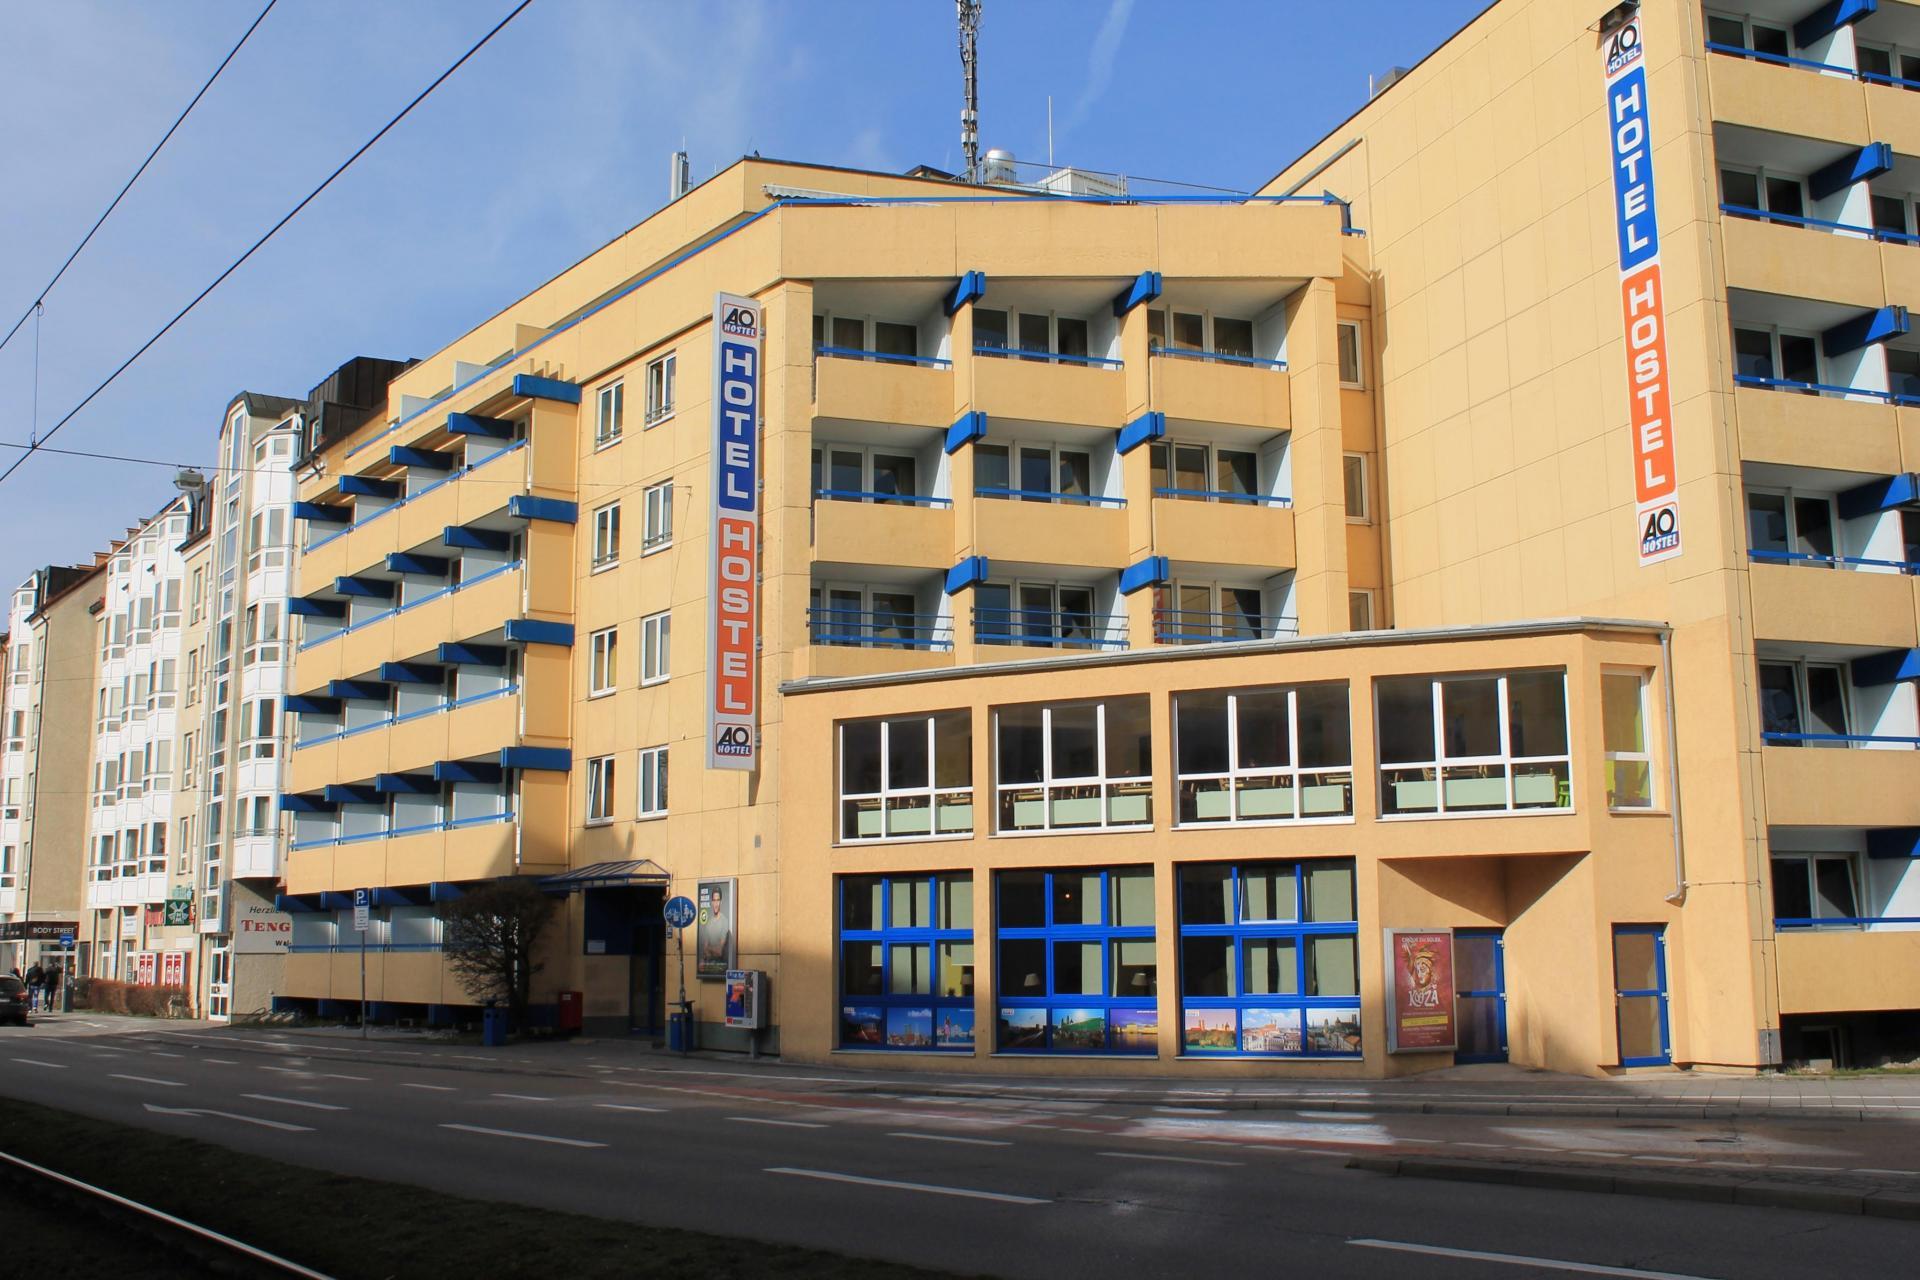 A&O München Hackerbrücke Hostel